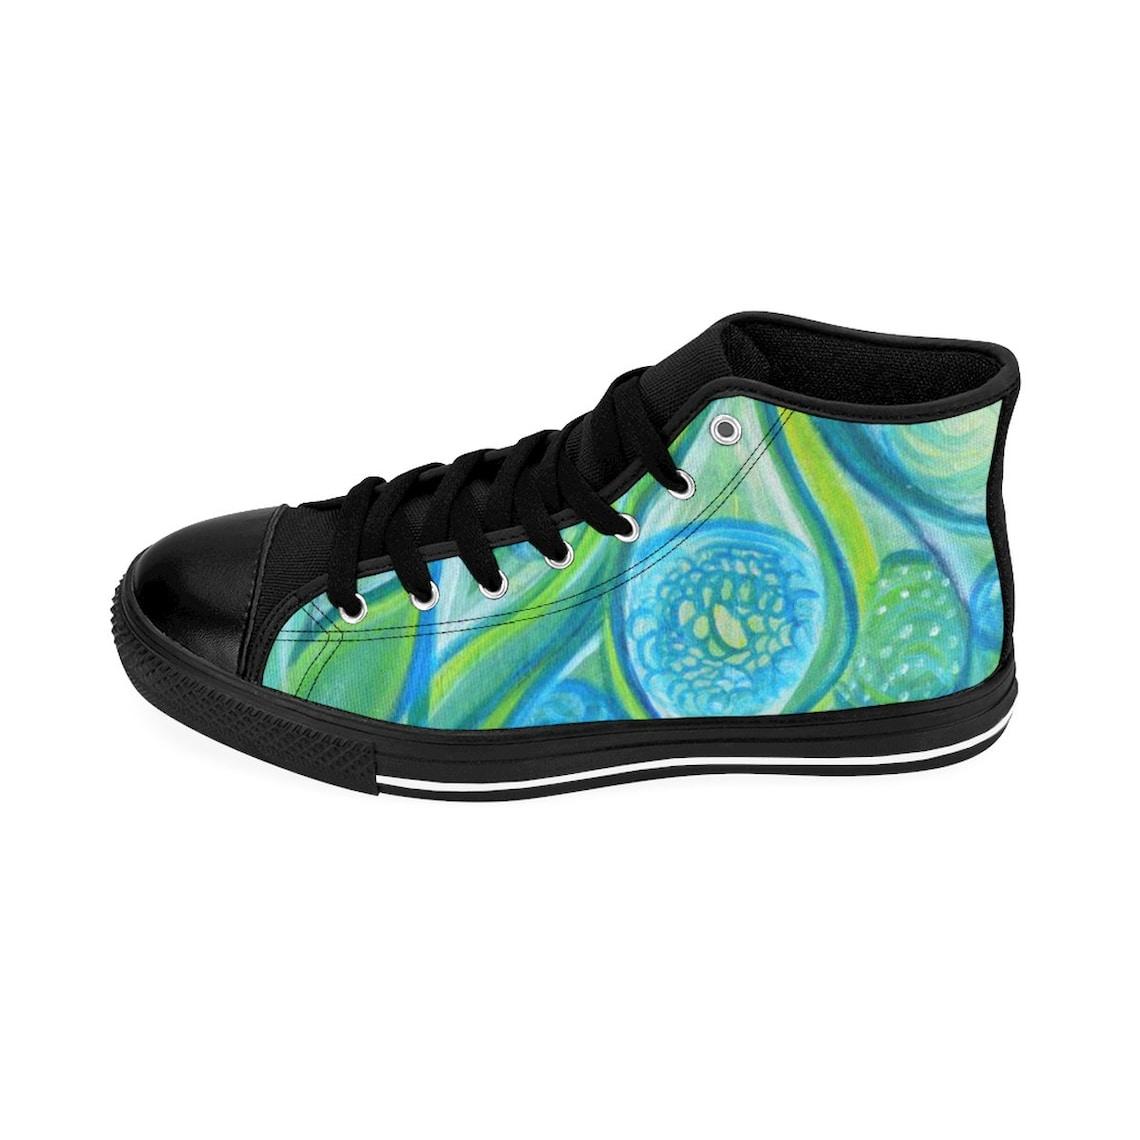 Womens Funky Eye High Top Sneakers Shoes